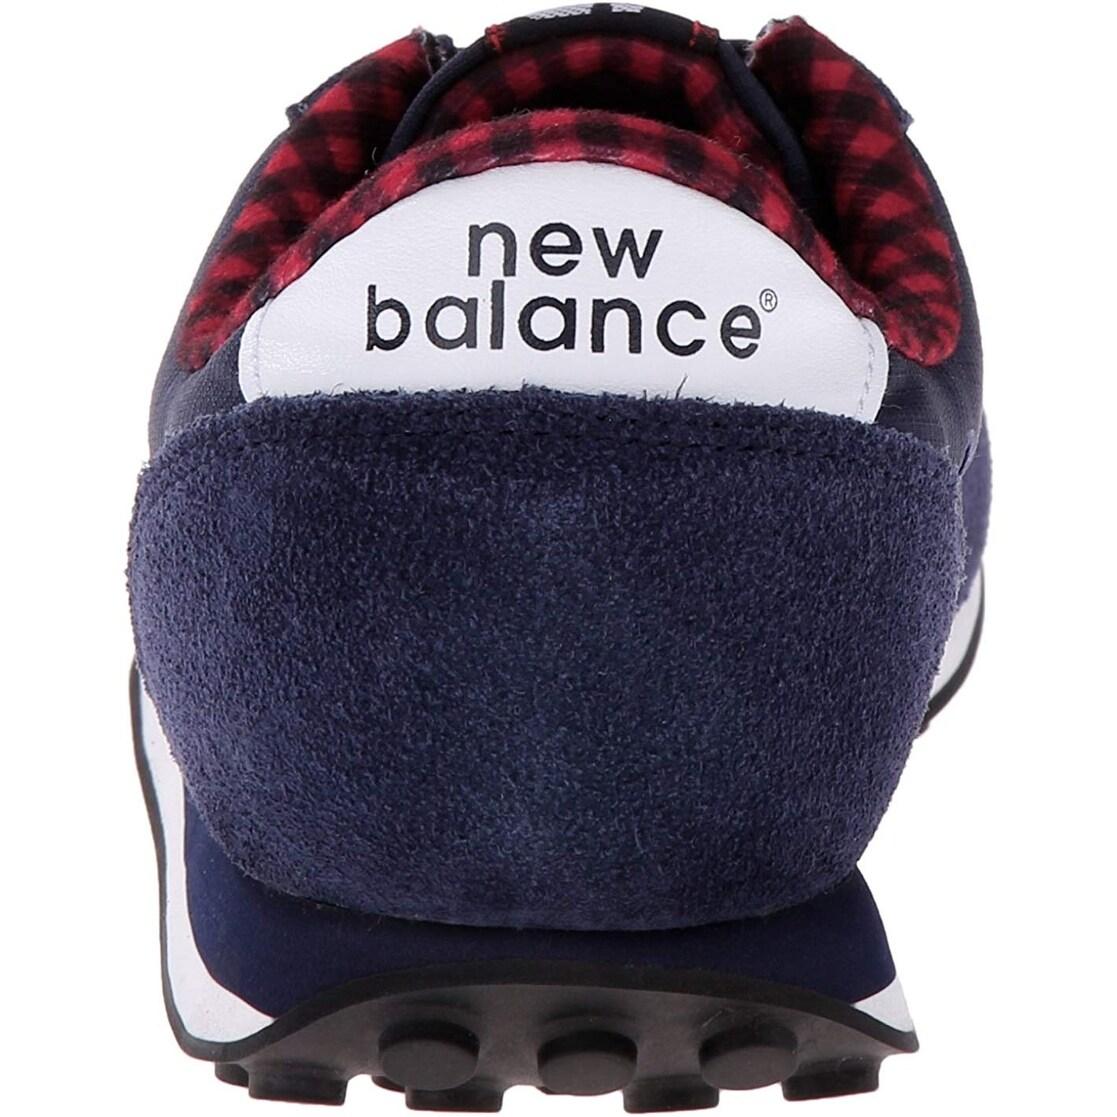 new balance wl 410 b